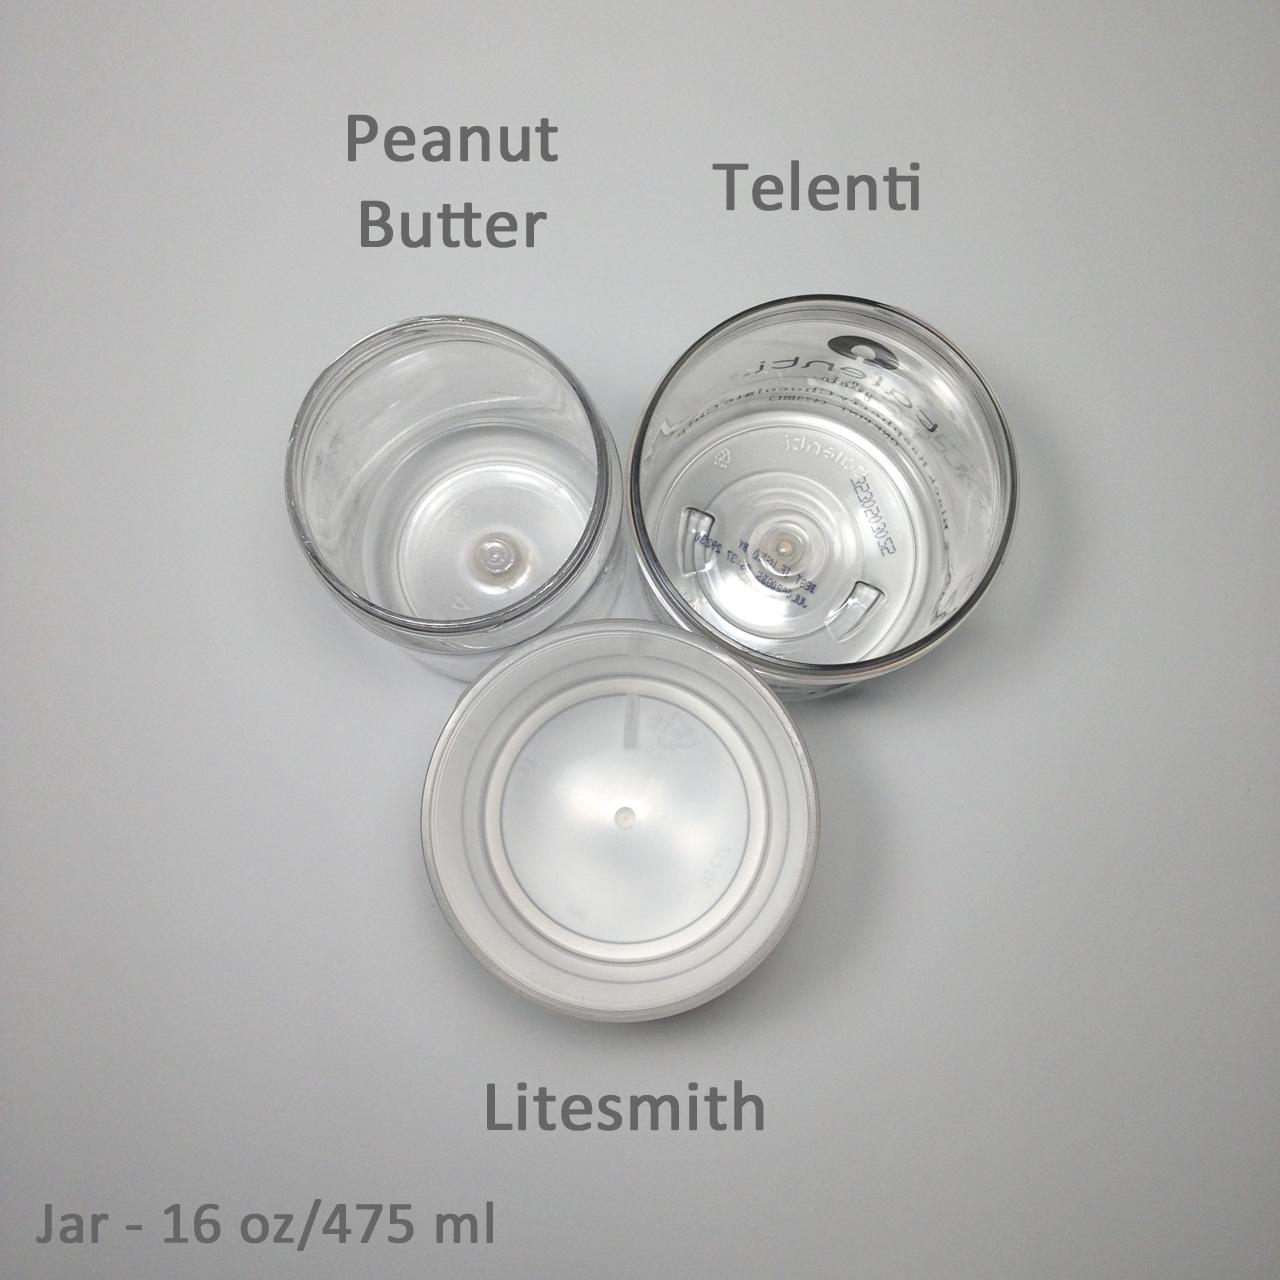 cold-soaking-jars-comparison3.jpg